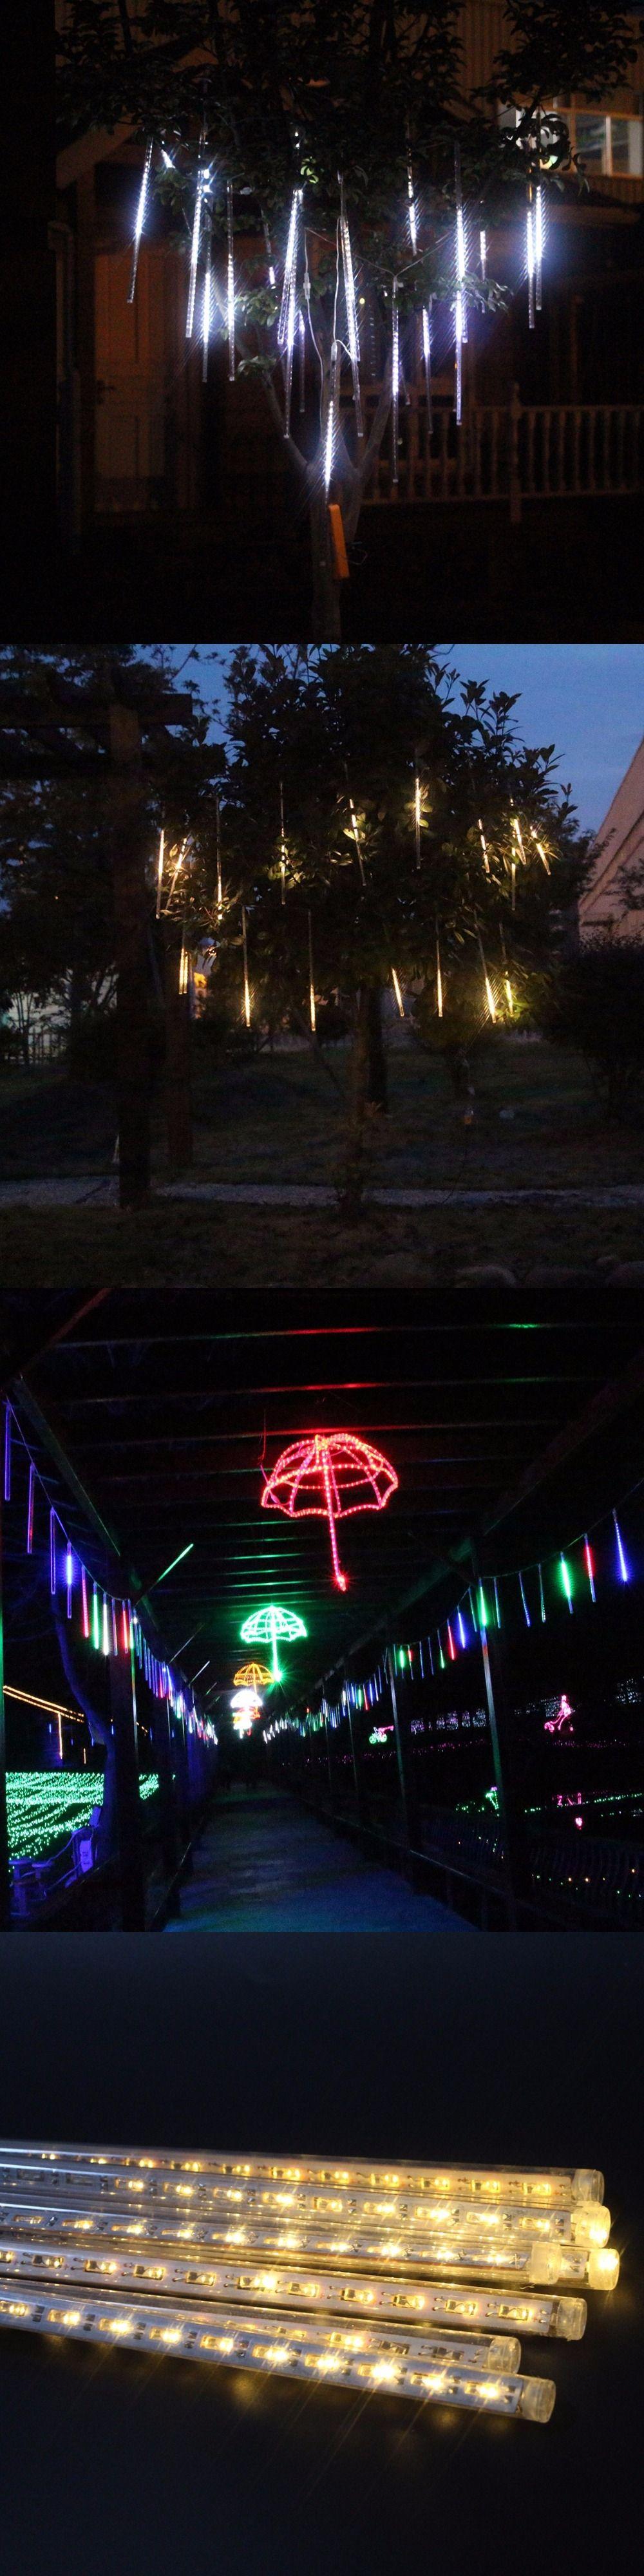 20cm led meteor rain tube christmas lights wedding holiday lighting party garden tree flasher light outdoor